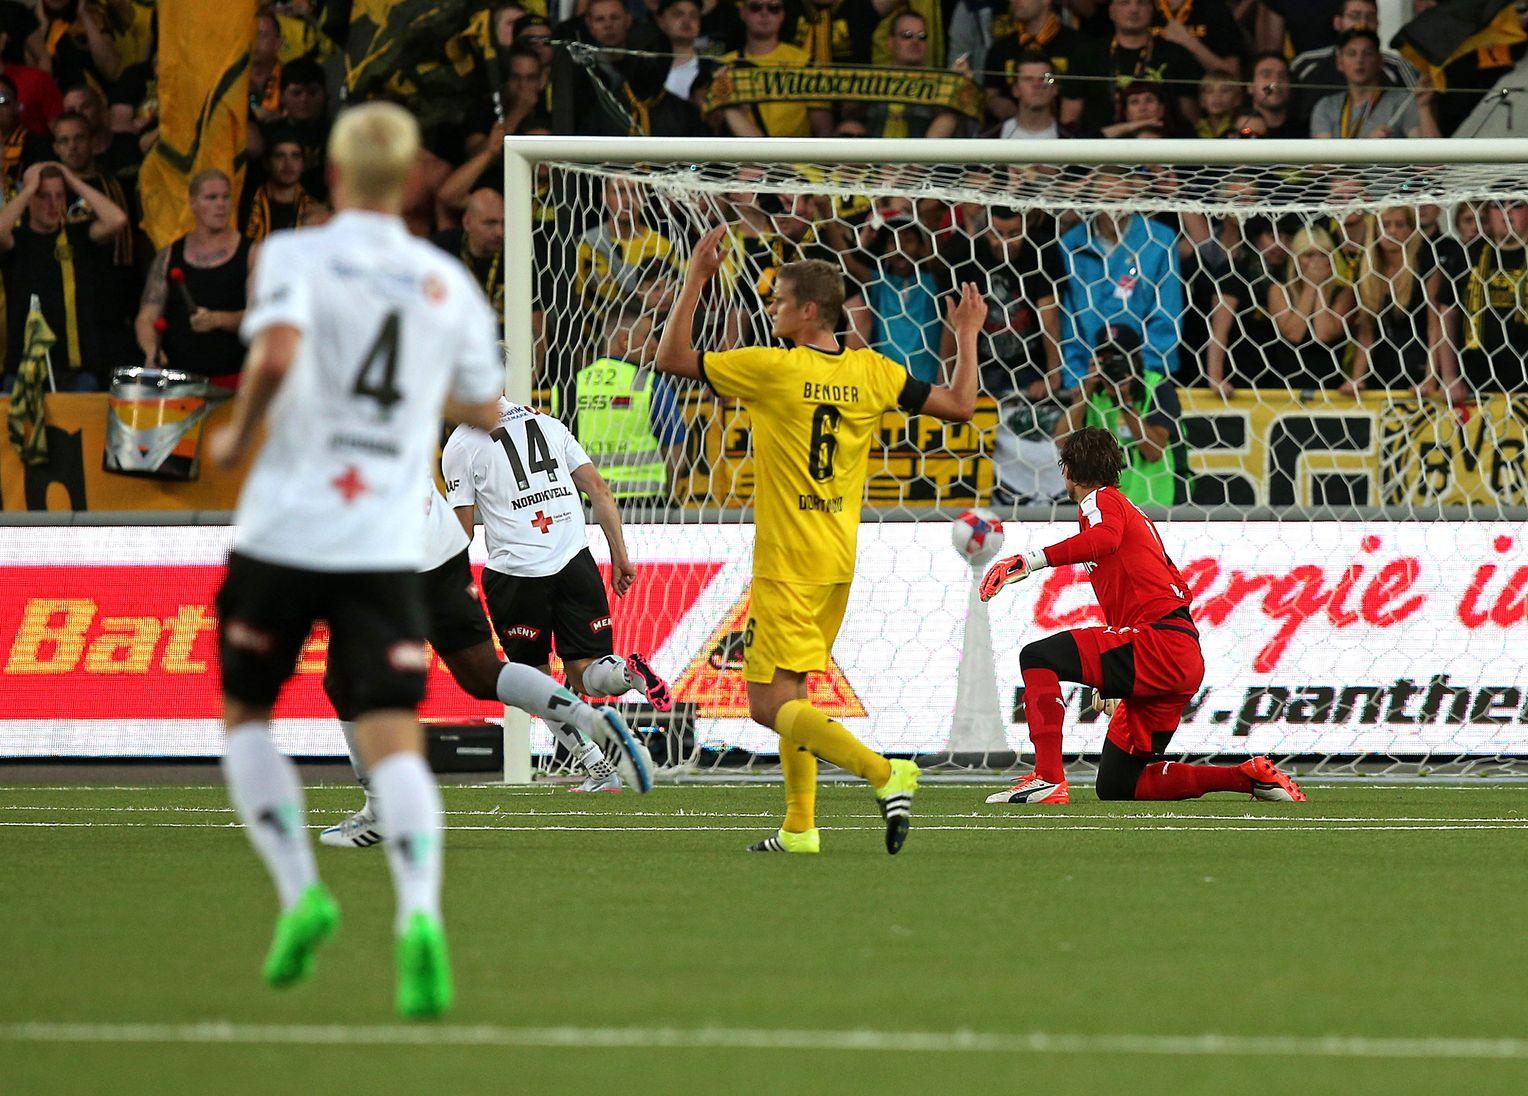 Odds Gegen Dortmund